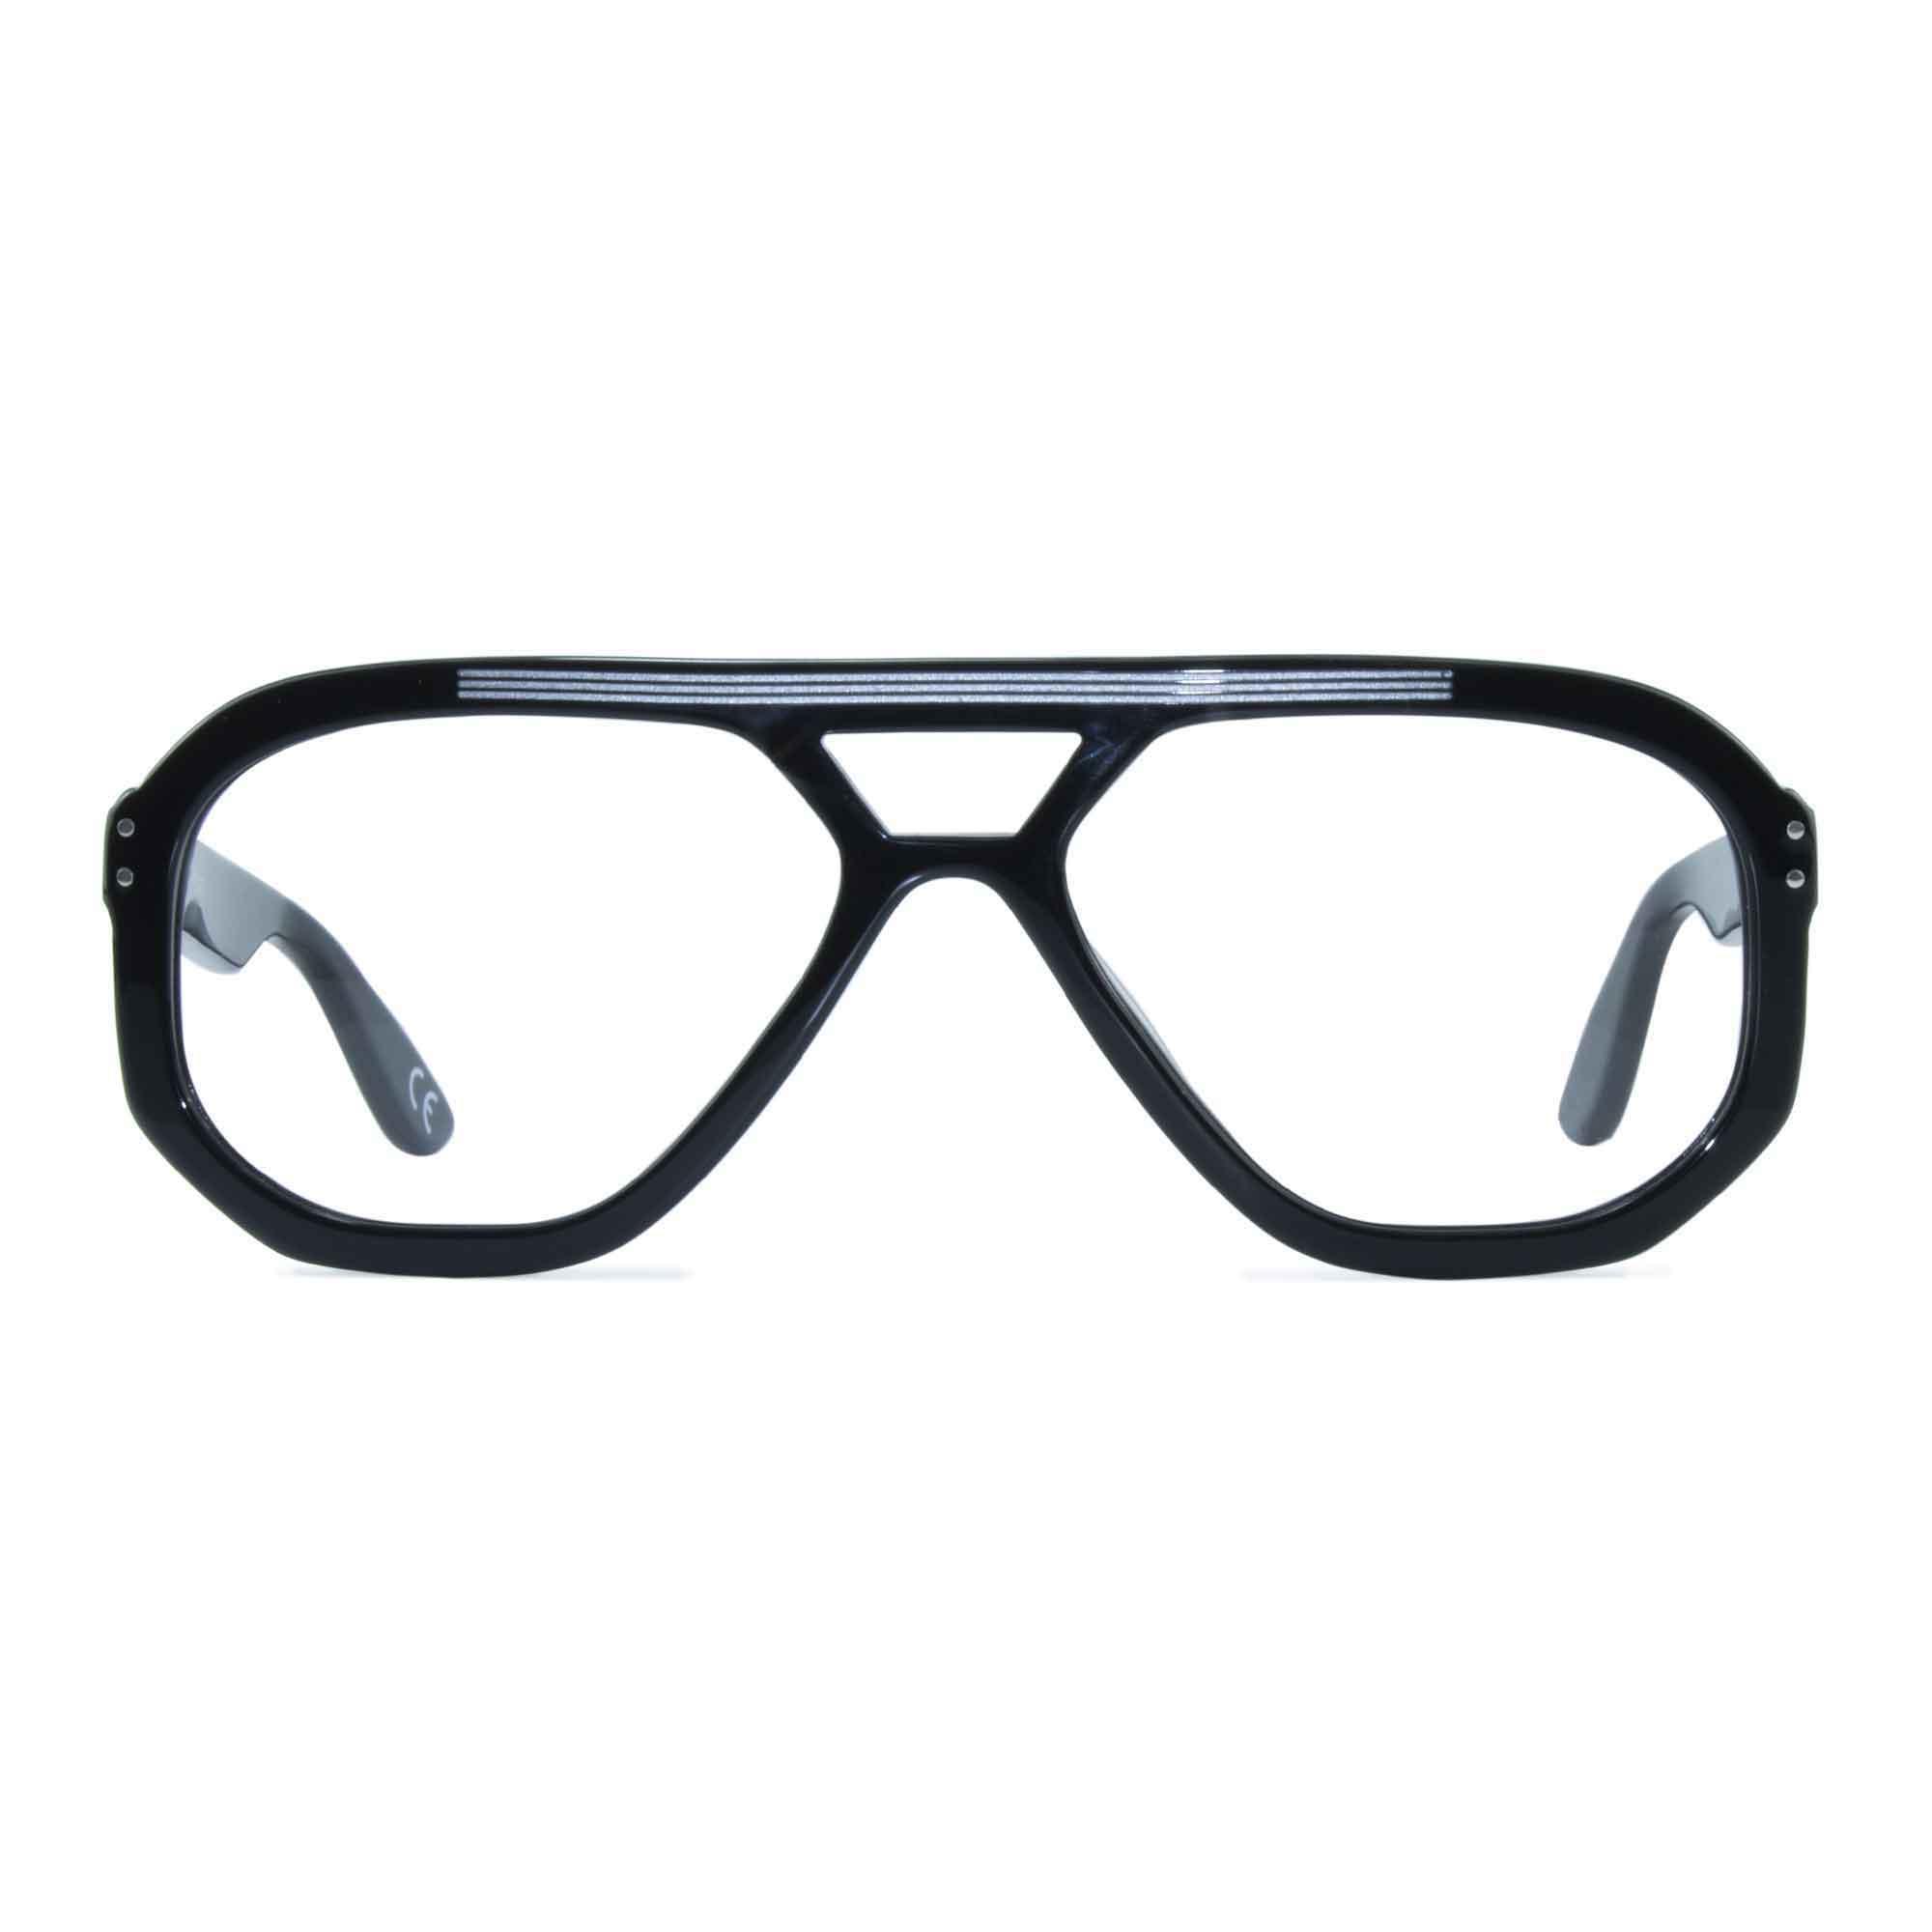 Joiuss jim black navigator glasses